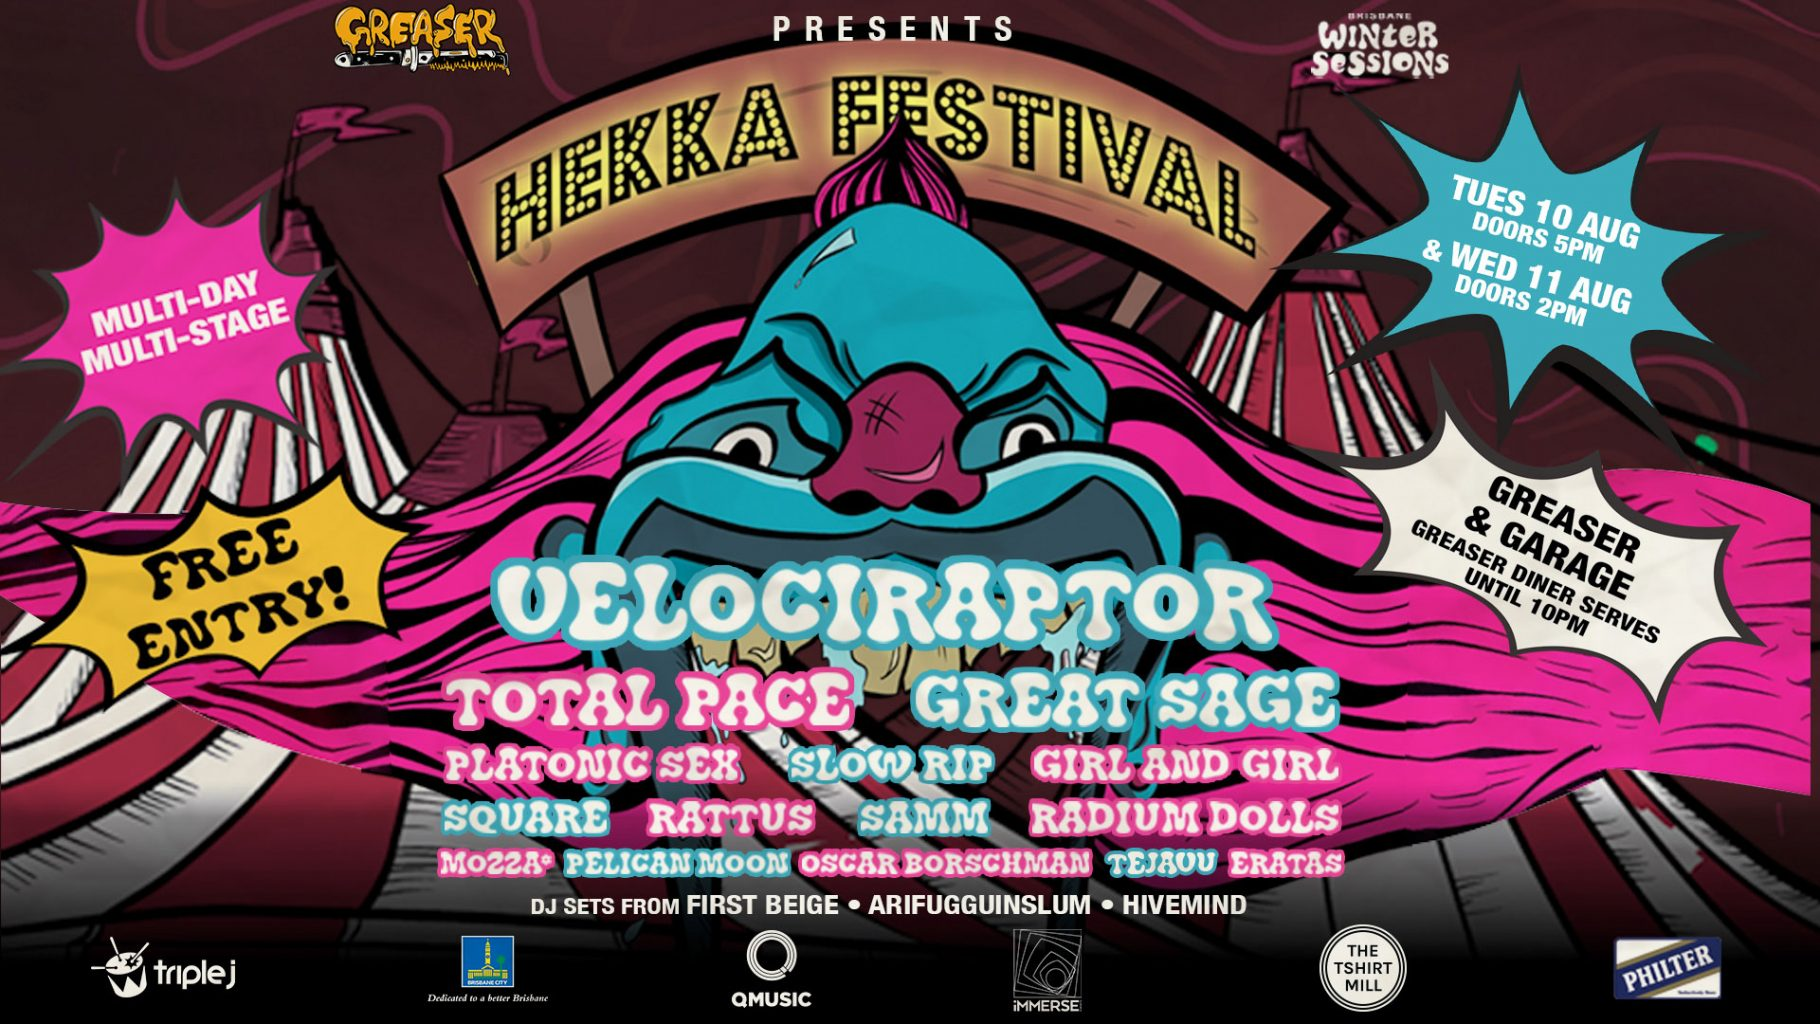 Hekka Festival